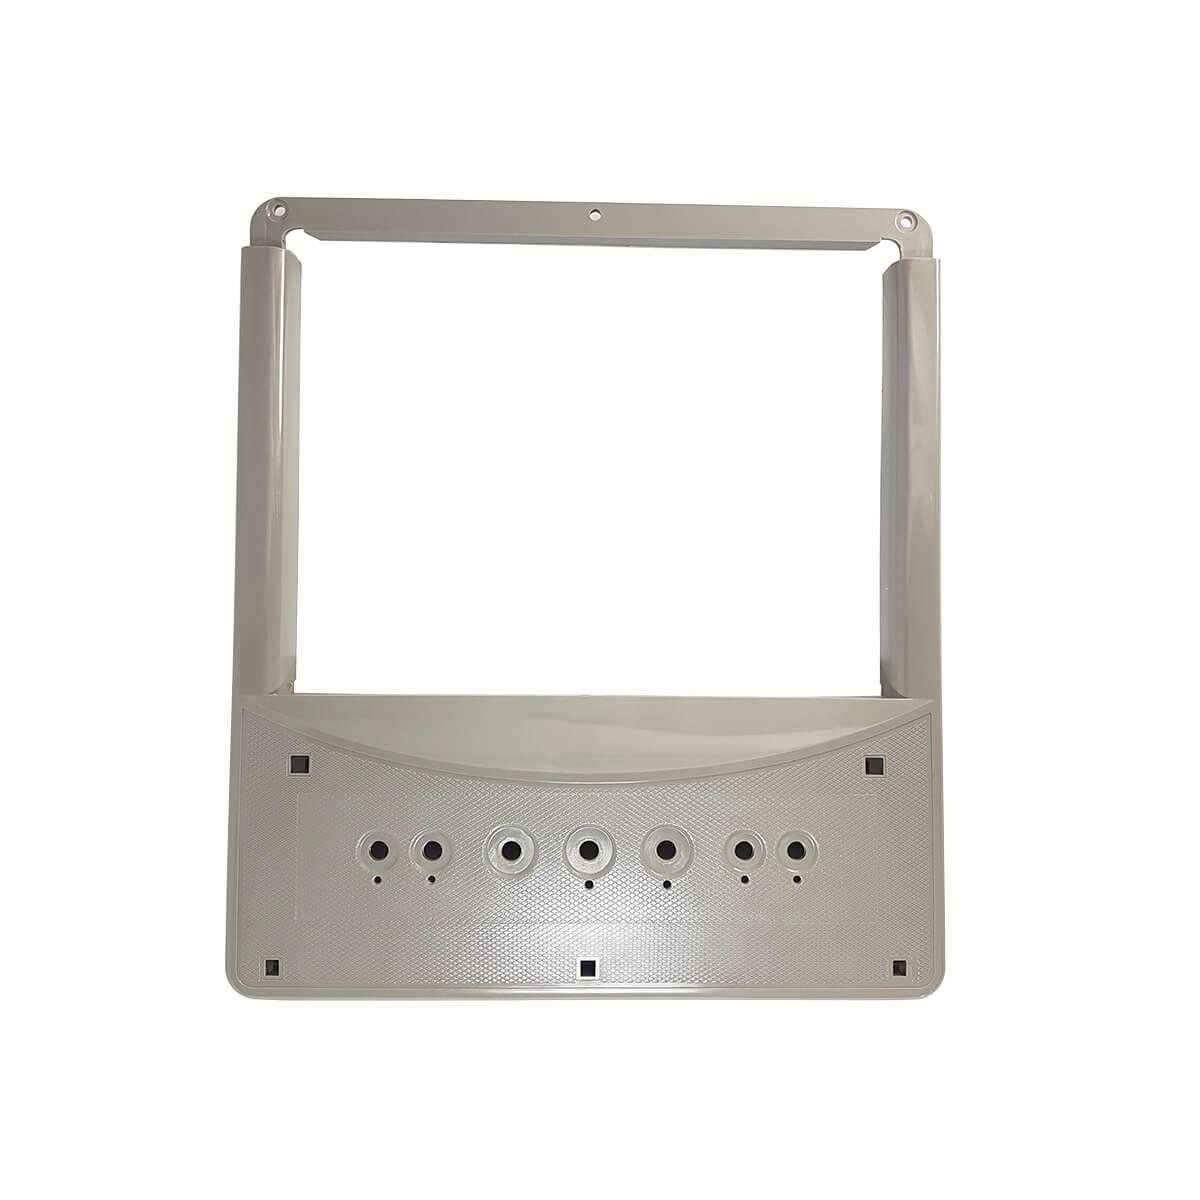 Tampa Módulo Prata Metálico Para Refrigerador Electrolux SS76X SS77X - 41678710